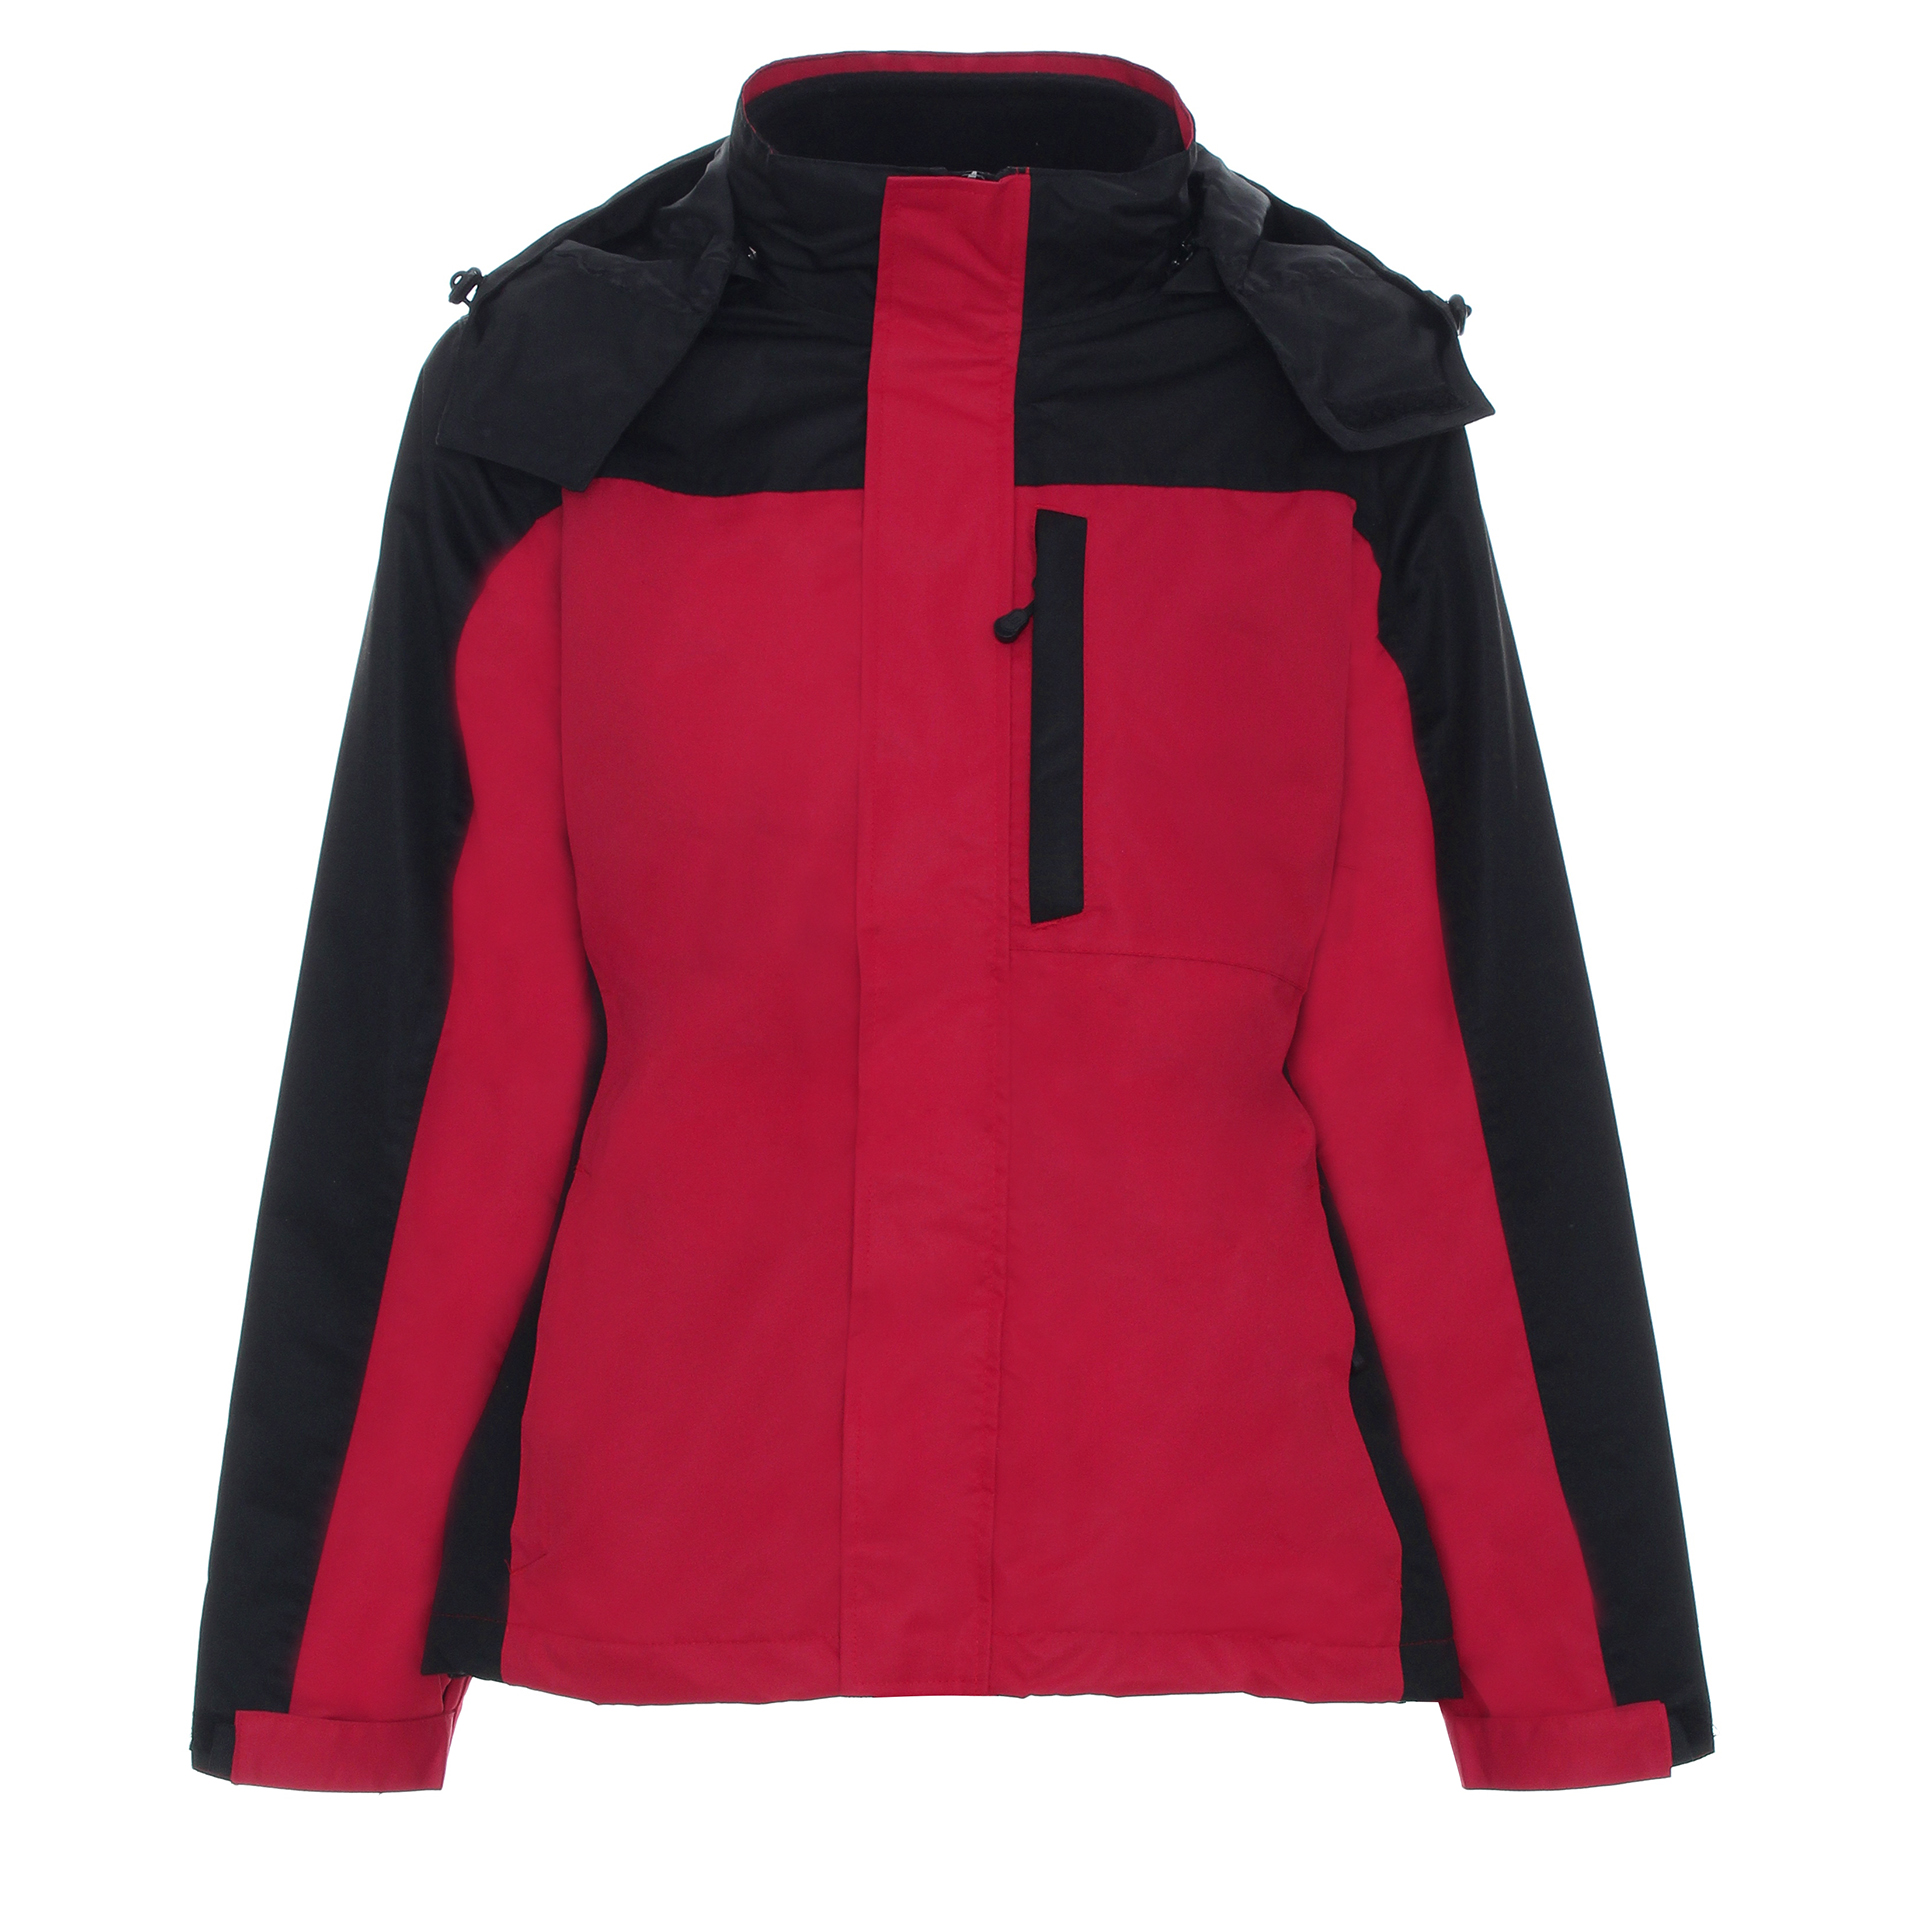 hike czerwono-czarna damska